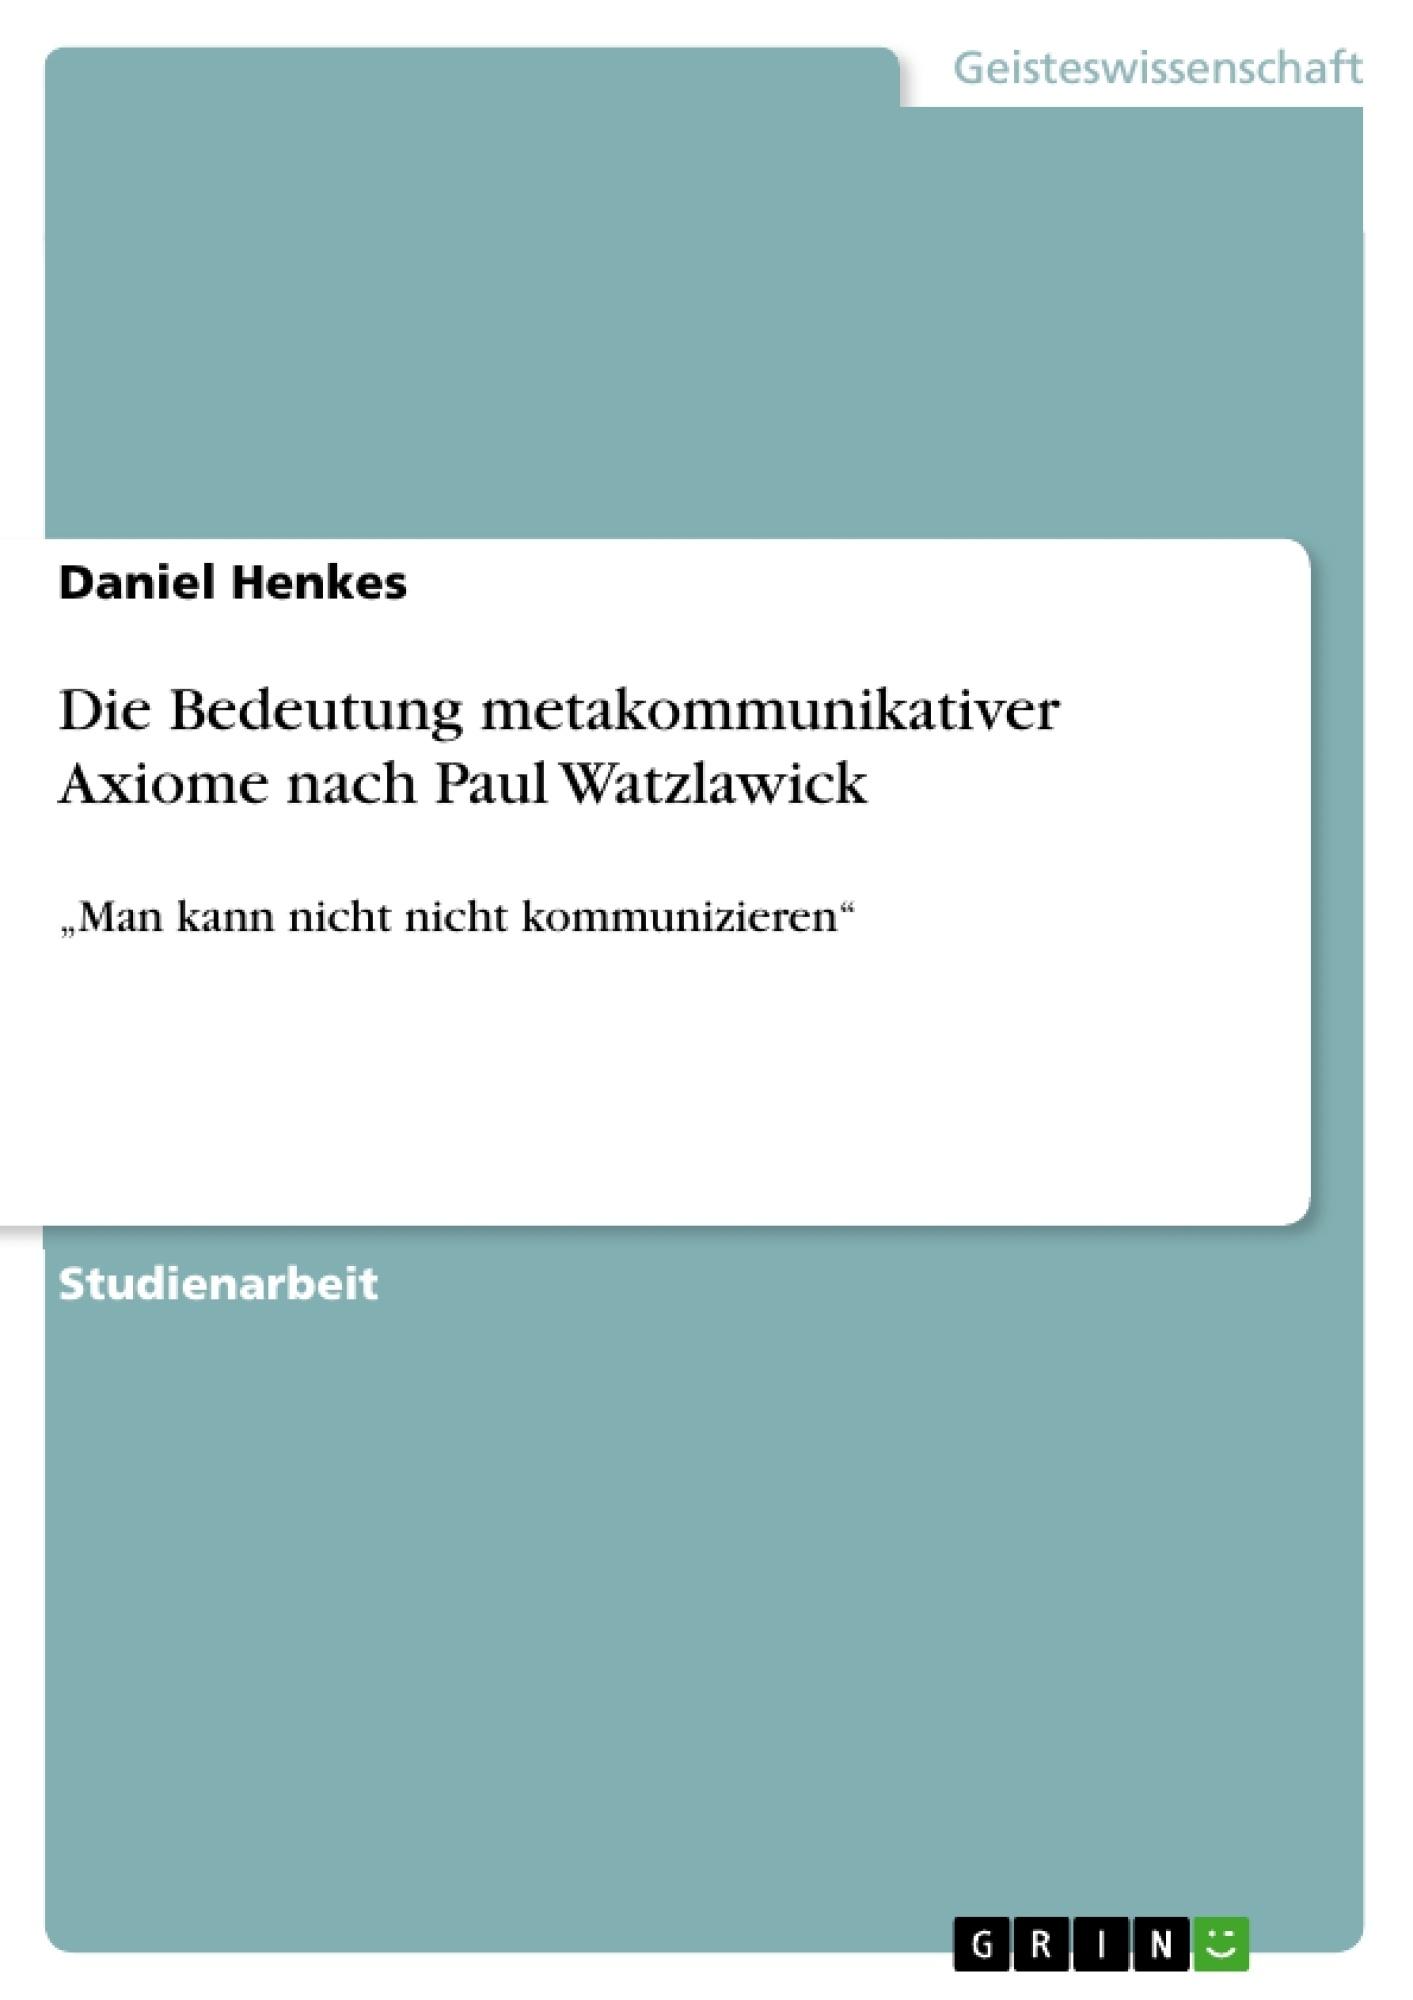 Titel: Die Bedeutung metakommunikativer Axiome nach Paul Watzlawick